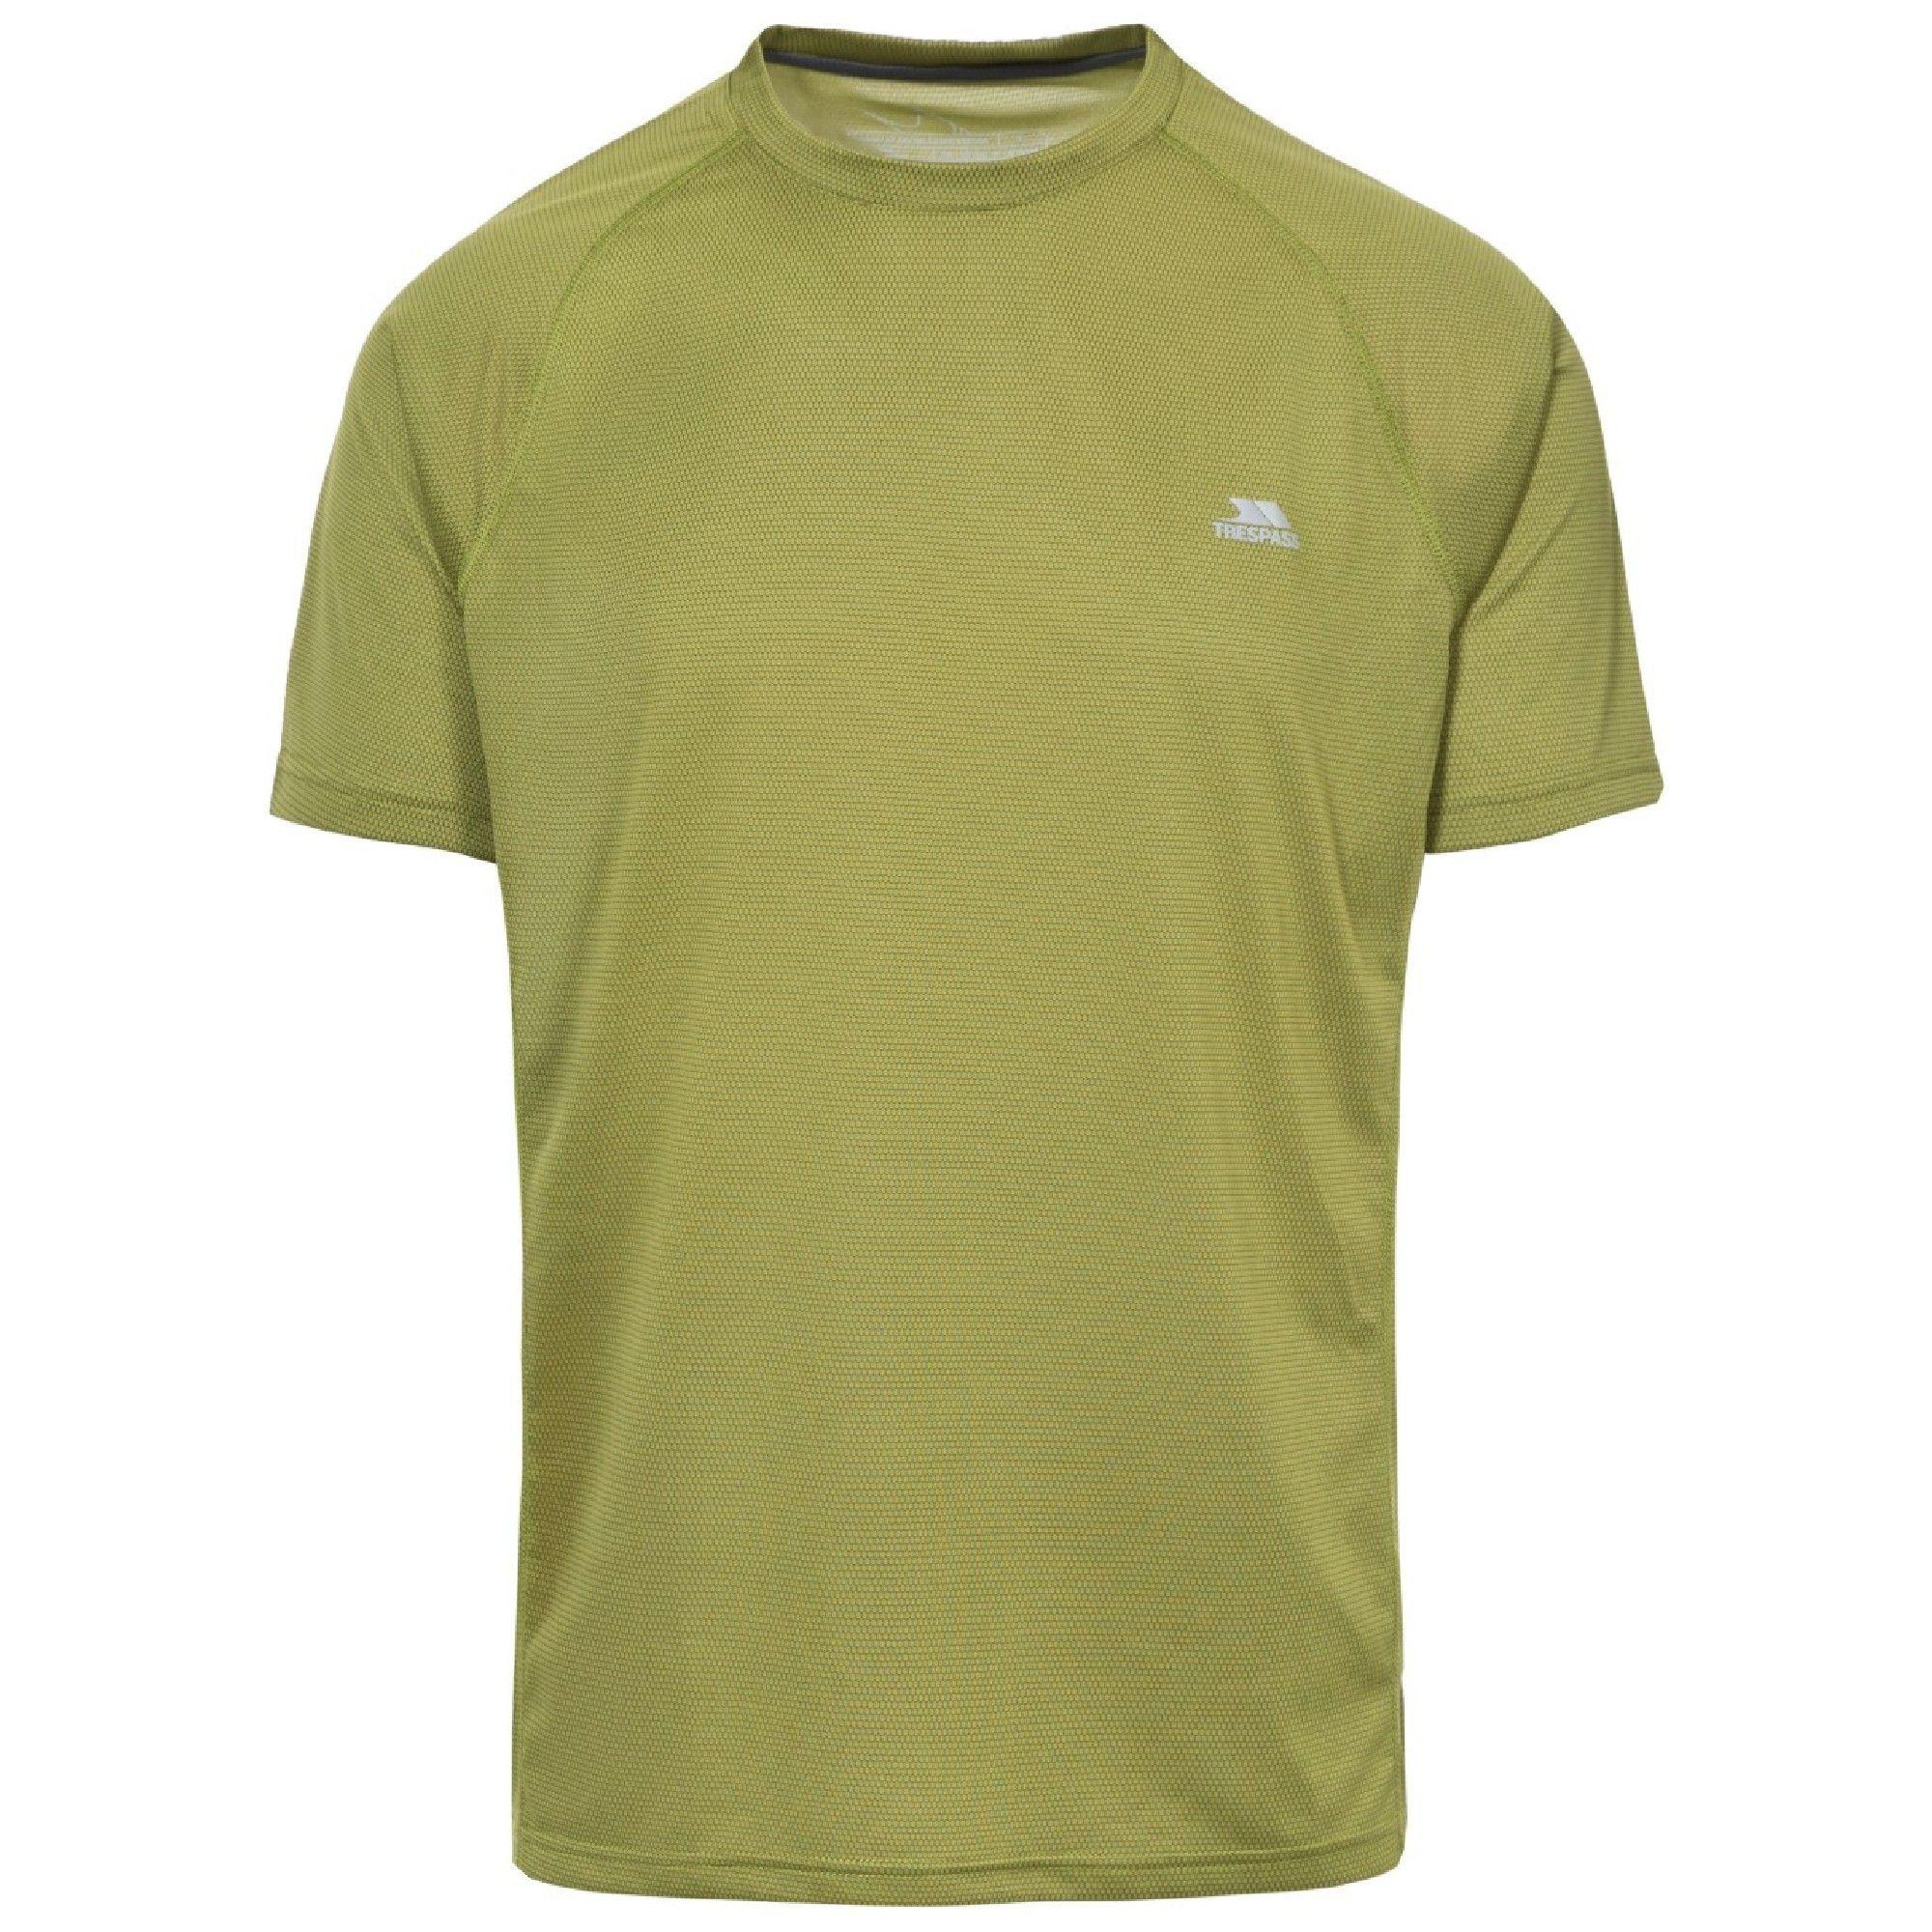 Trespass Mens Esker Active T-Shirt